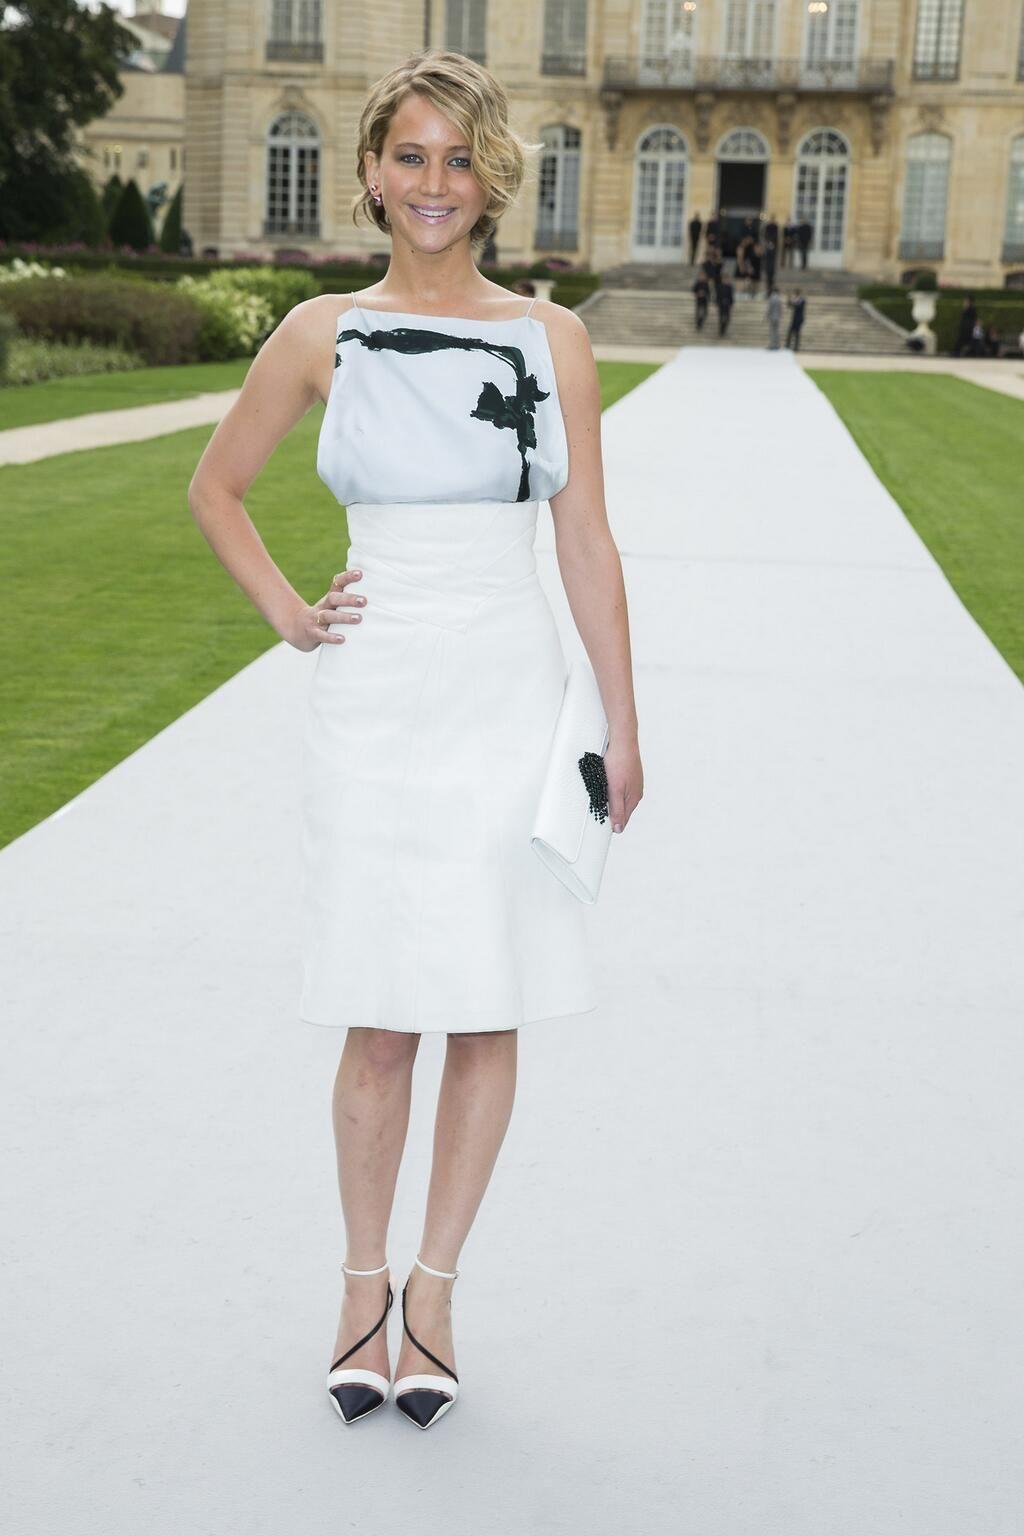 Jennifer Lawrence at Christian Dior fashion show, Paris 2014